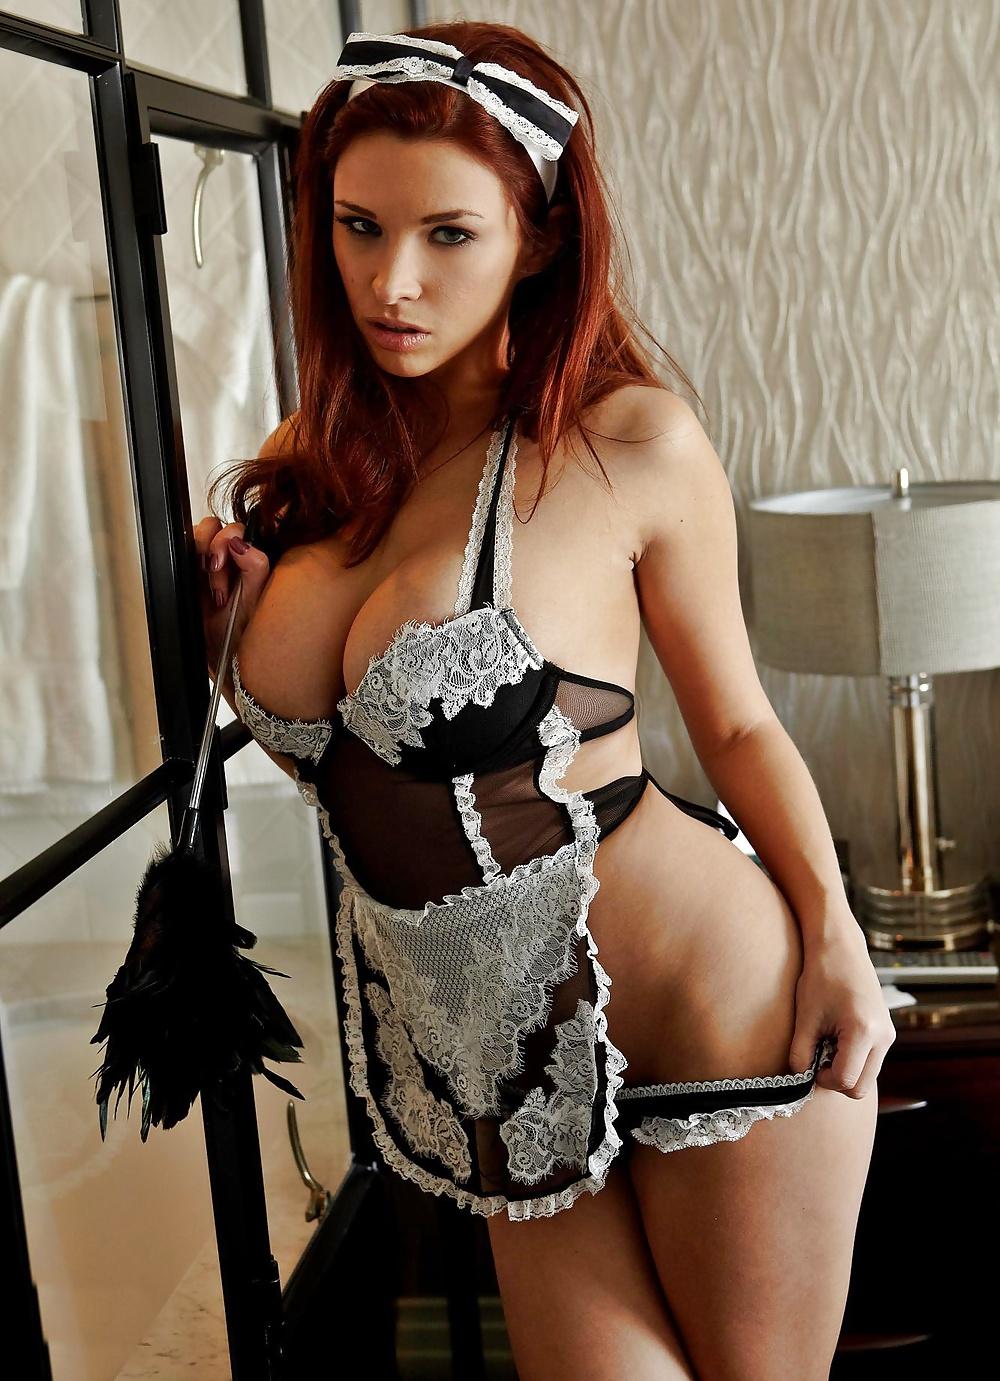 Taylore jerk sexy uniform cleavage renee occonor